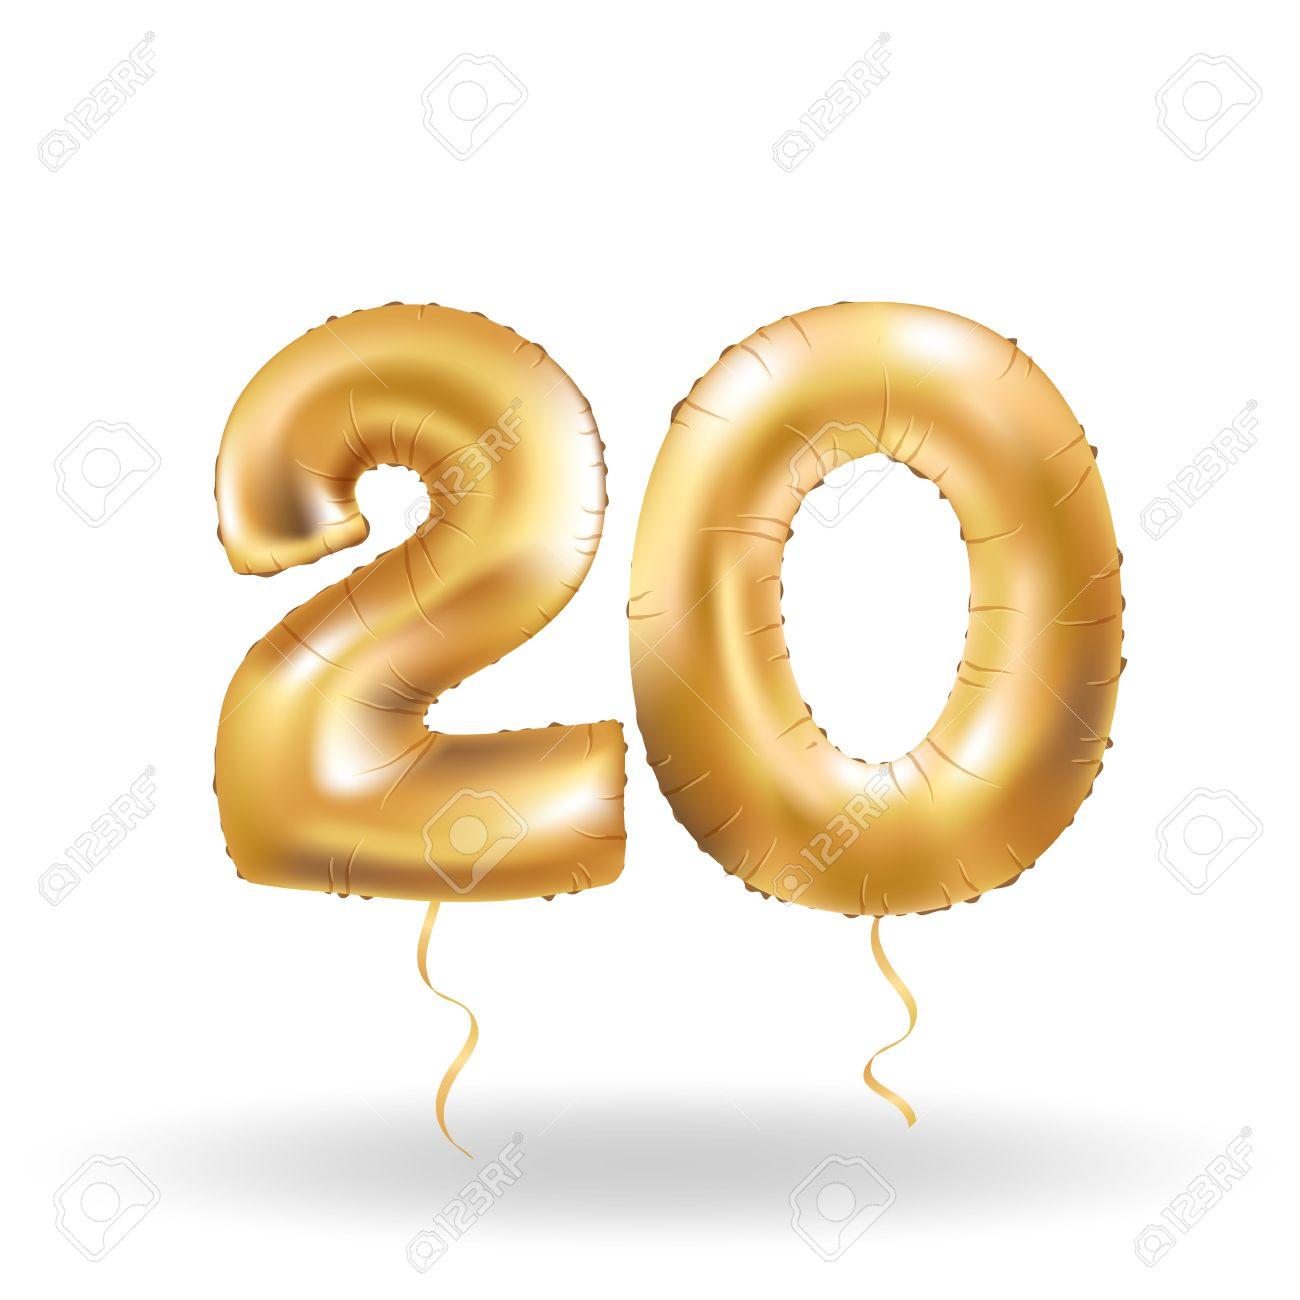 Golden number 20 twenty metallic balloon. Party decoration golden balloons. Anniversary sign for happy holiday, celebration, birthday, carnival, new year. Metallic design balloon. - 67064243